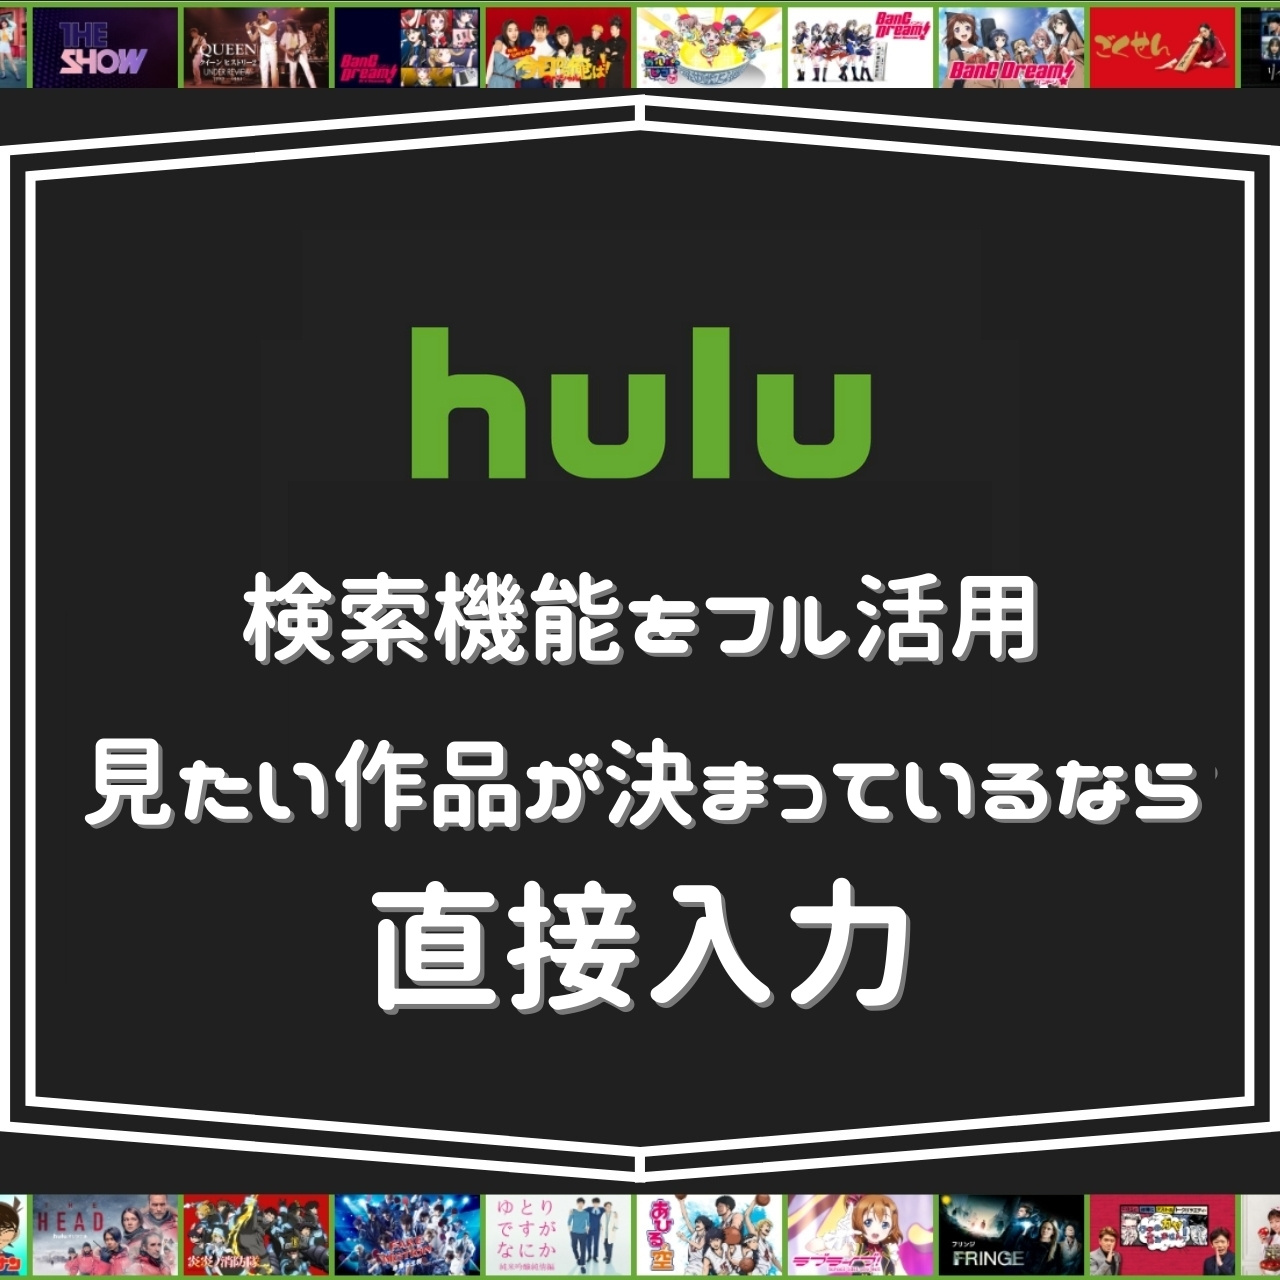 Huluの検索機能をフル活用|見たい作品が決まっているなら直接入力